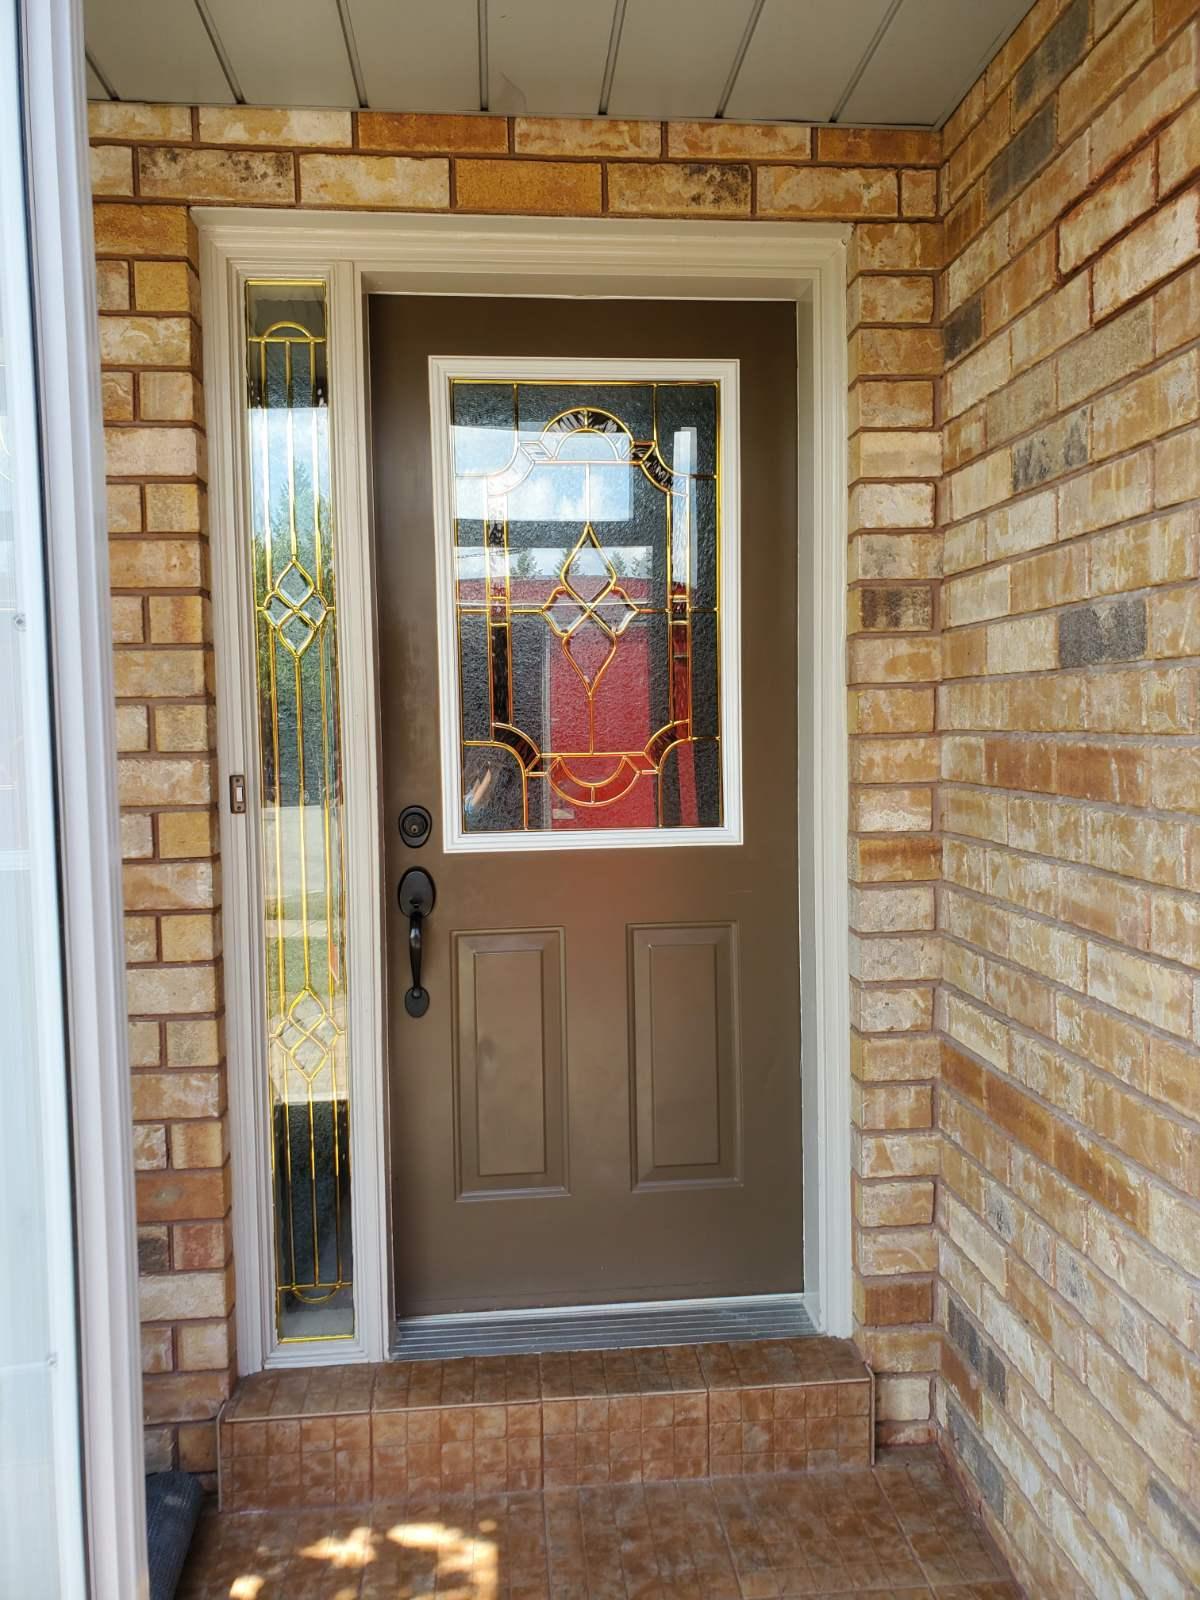 Fiberglass and Steel Door Installation and Replacement, PVC and Vinyl Windows, Woodbridge, Maple, Vaughan, King, Aurora, Nemwarket, Caledon, Nobleton, Kleinburg, Scarborough